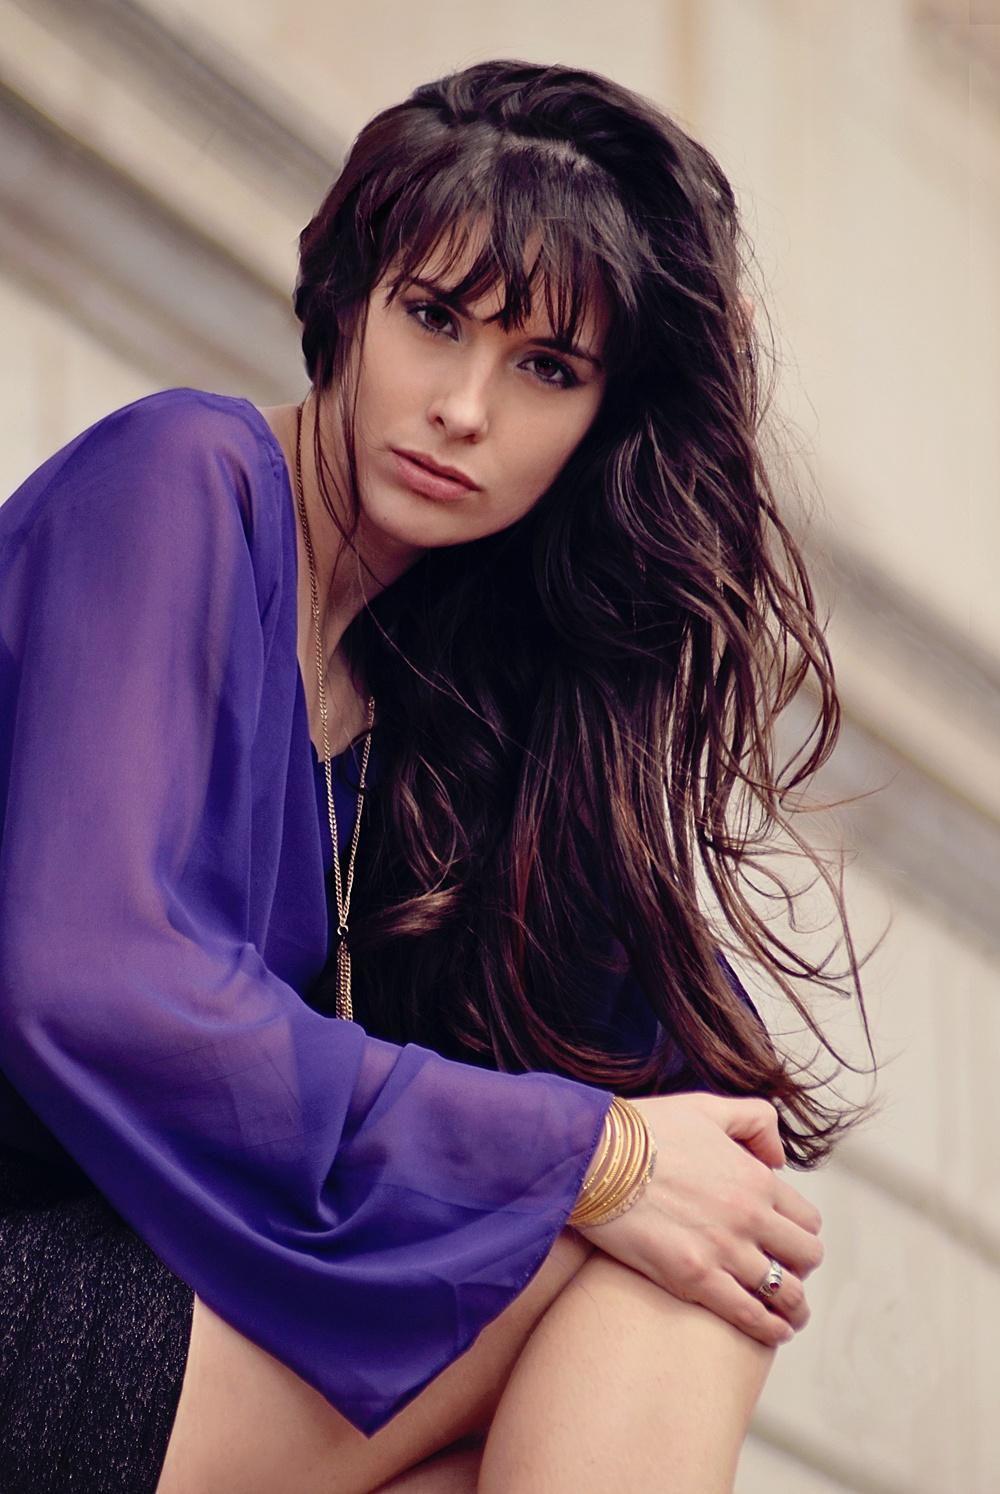 Samantha Blakeley